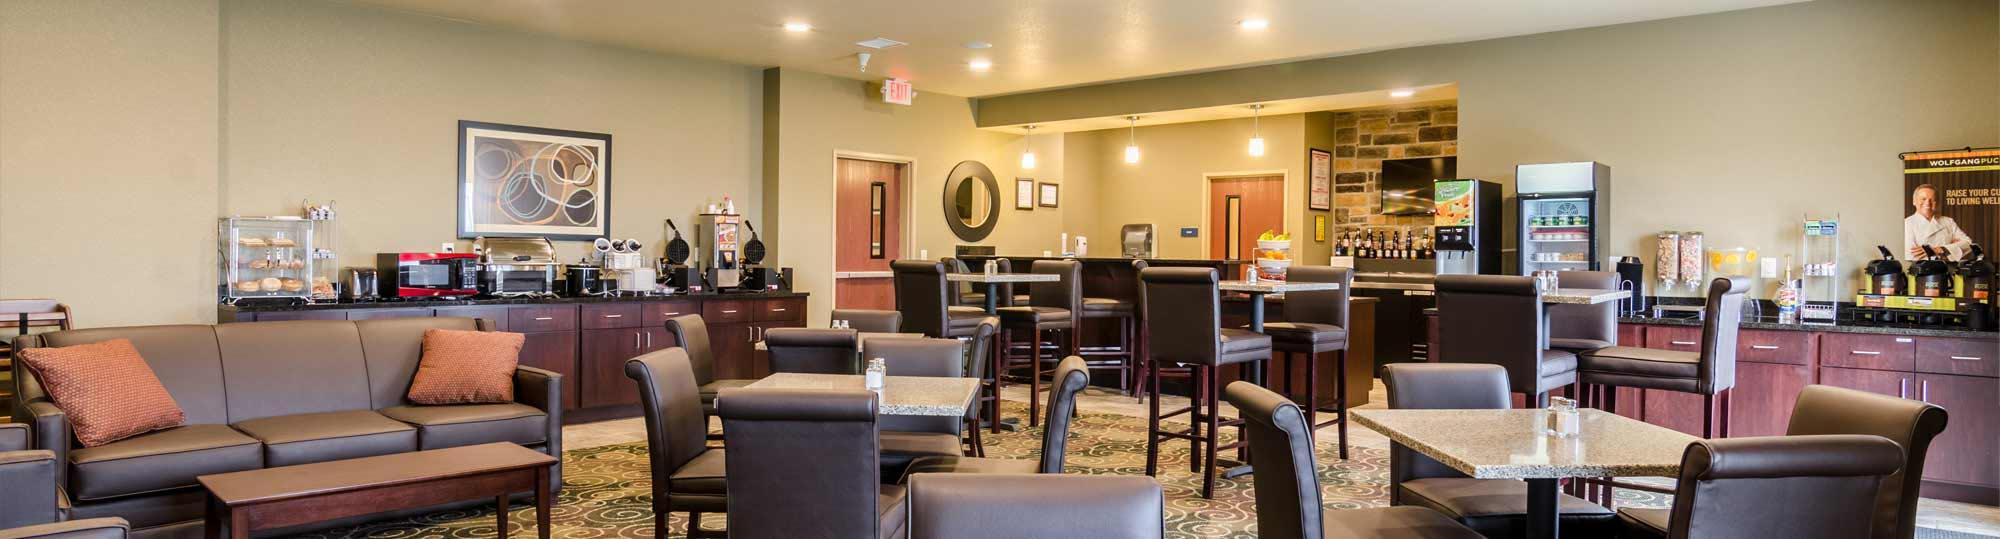 Cobblestone Hotel and Suites McCook